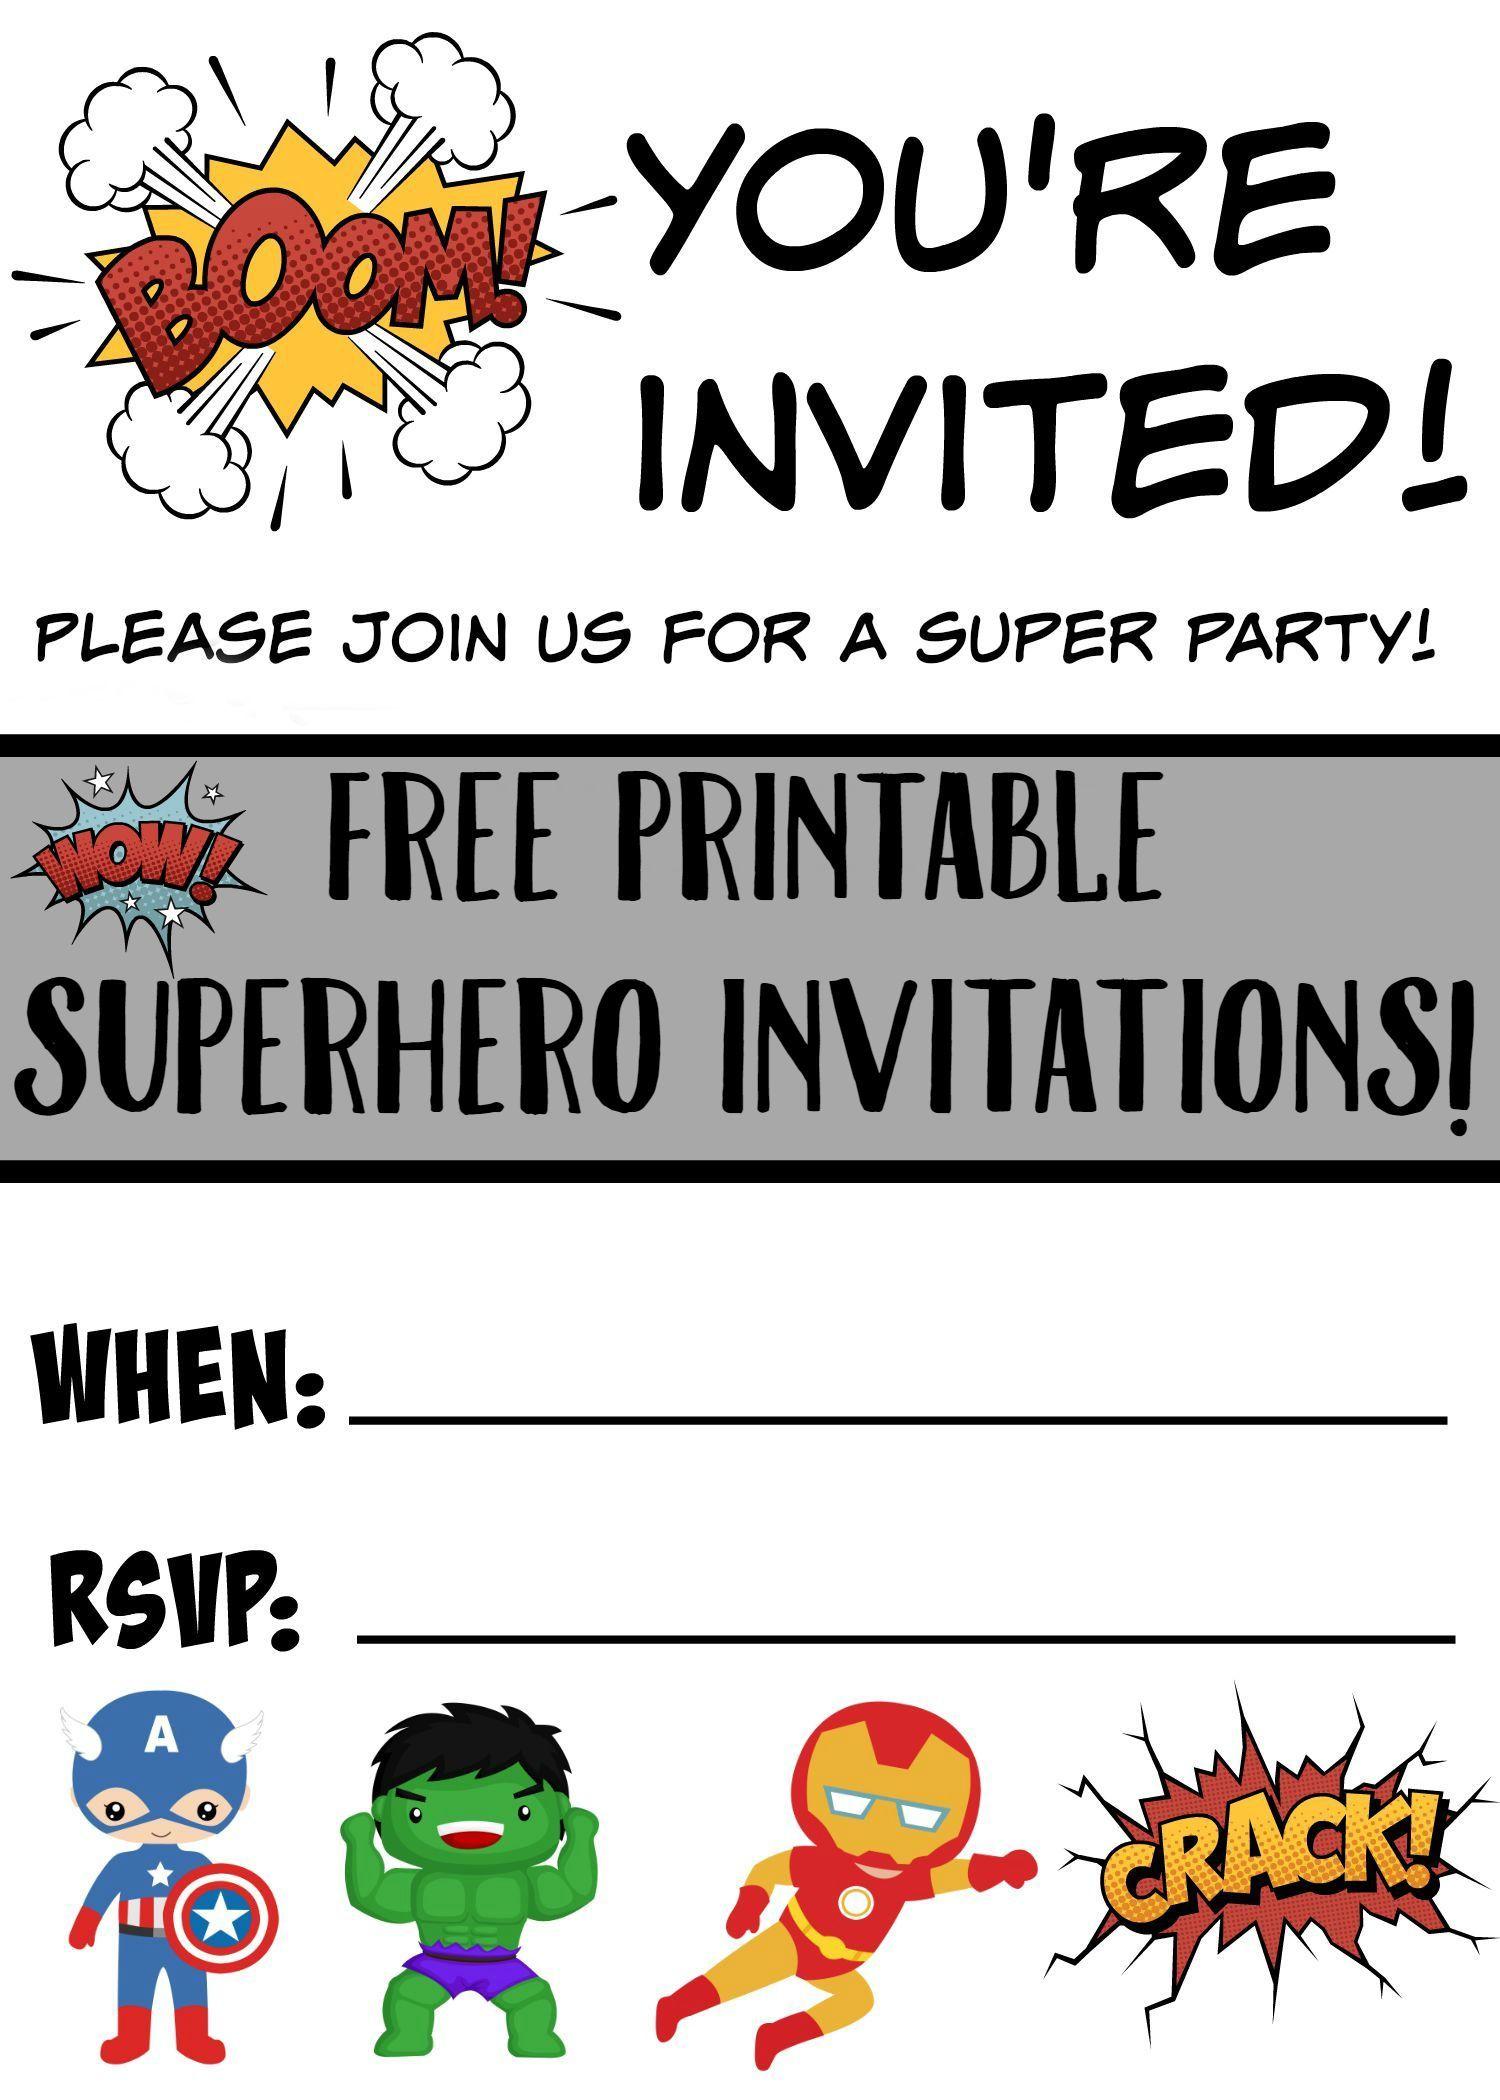 Free Printable Superhero Birthday Invitations – Superhero Birthday Invitations Free Printable